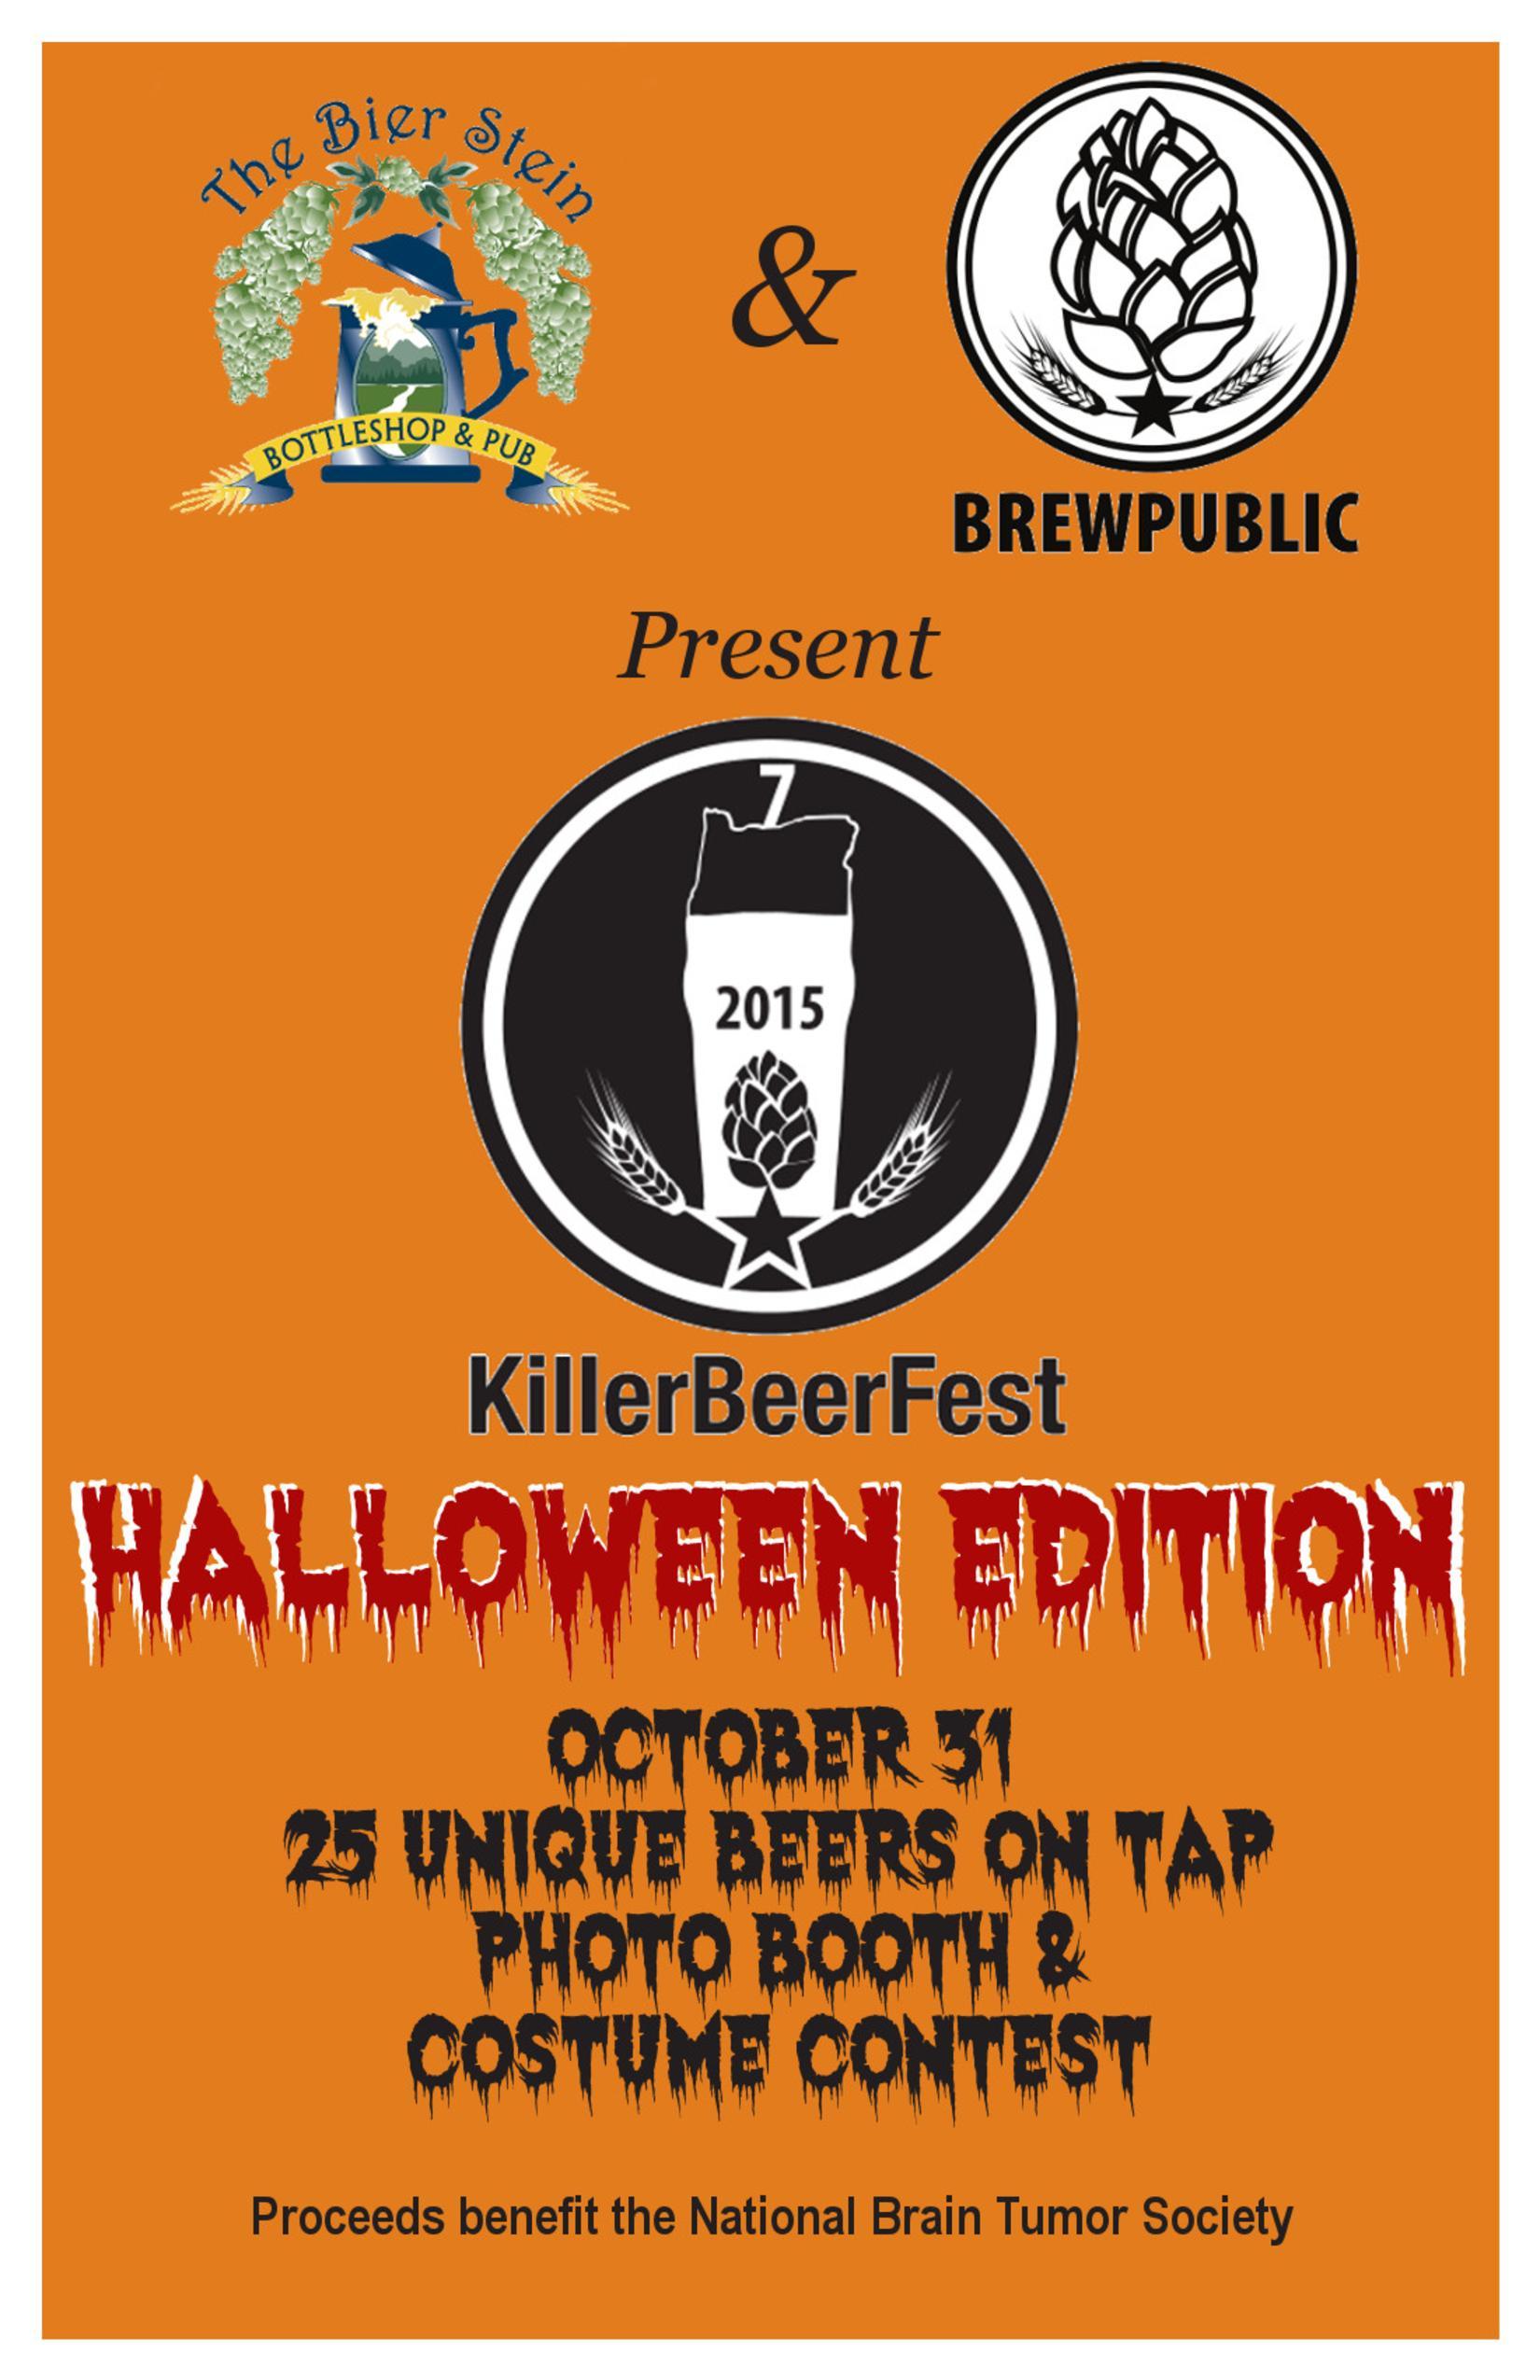 Halloween Bier.Brewpublic Killerbeerfest Halloween Eugene Edition